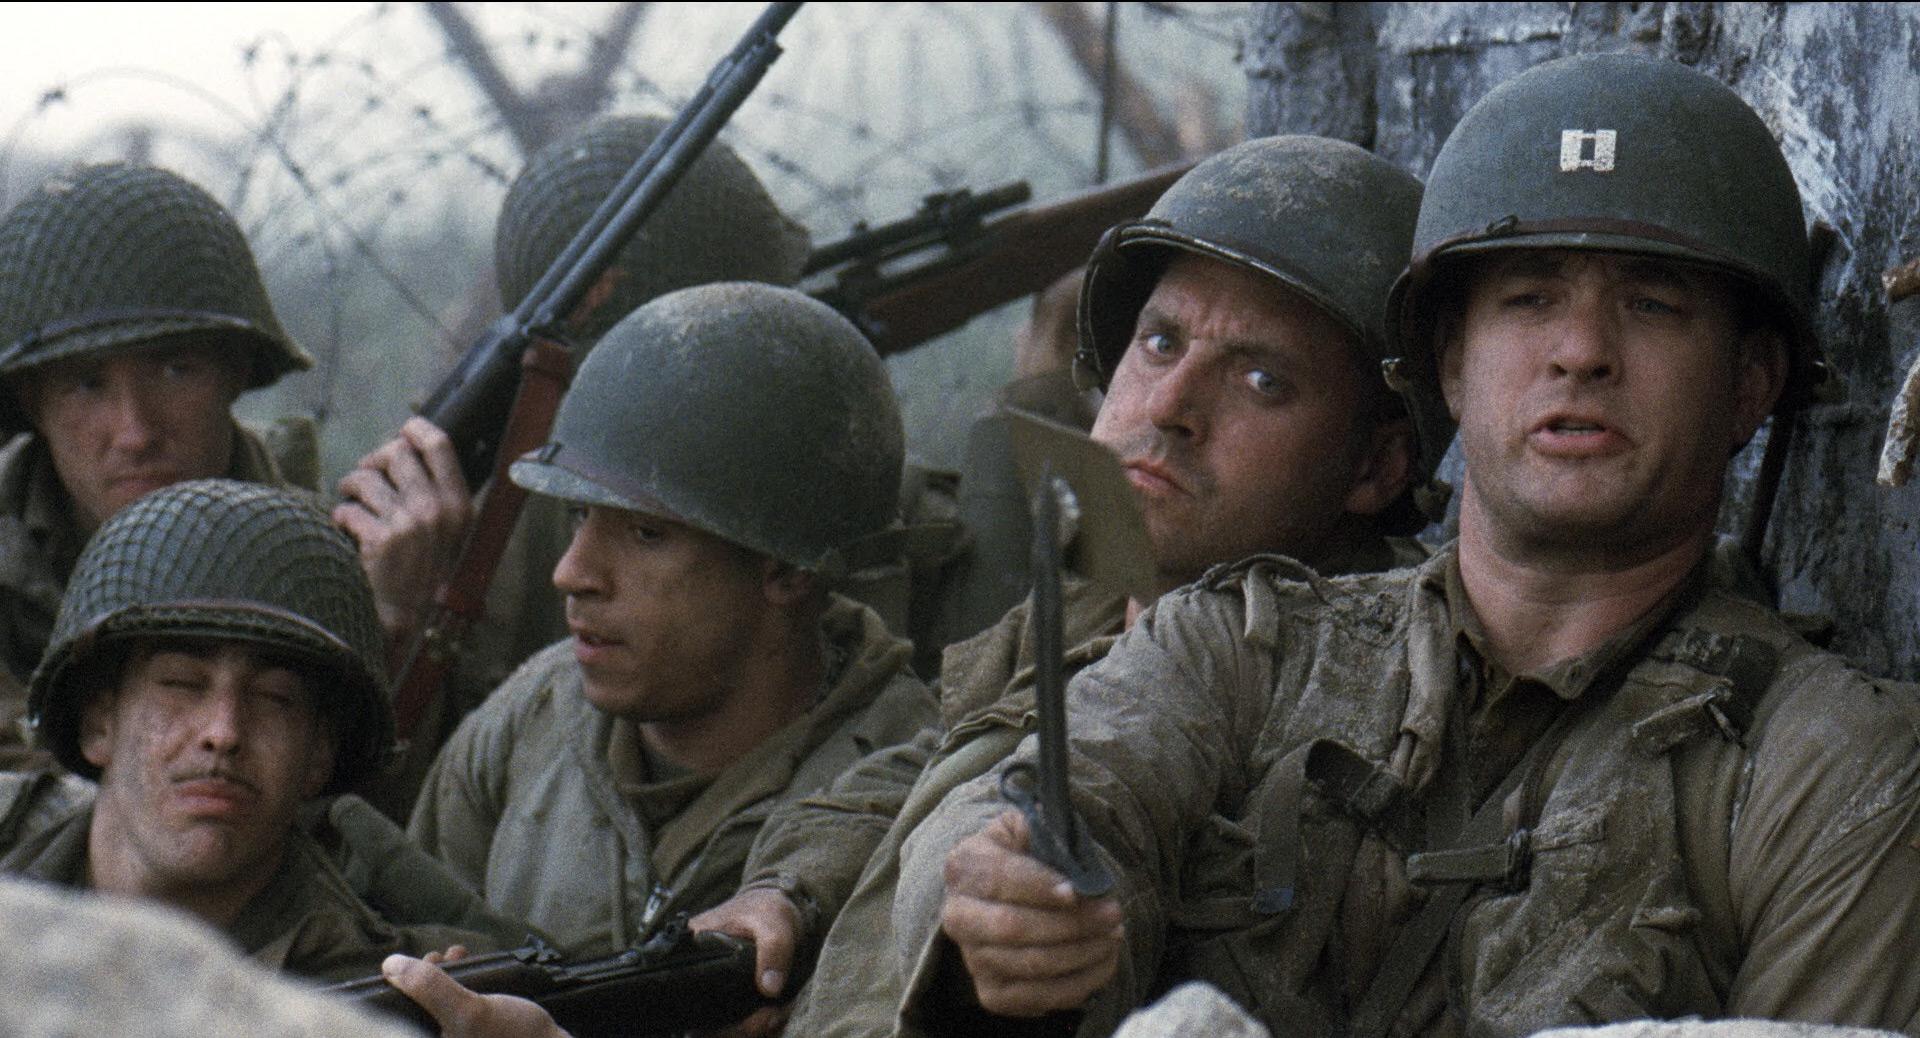 Saving Private Ryan's harrowing 23-minute opening scene cost $12 million to make